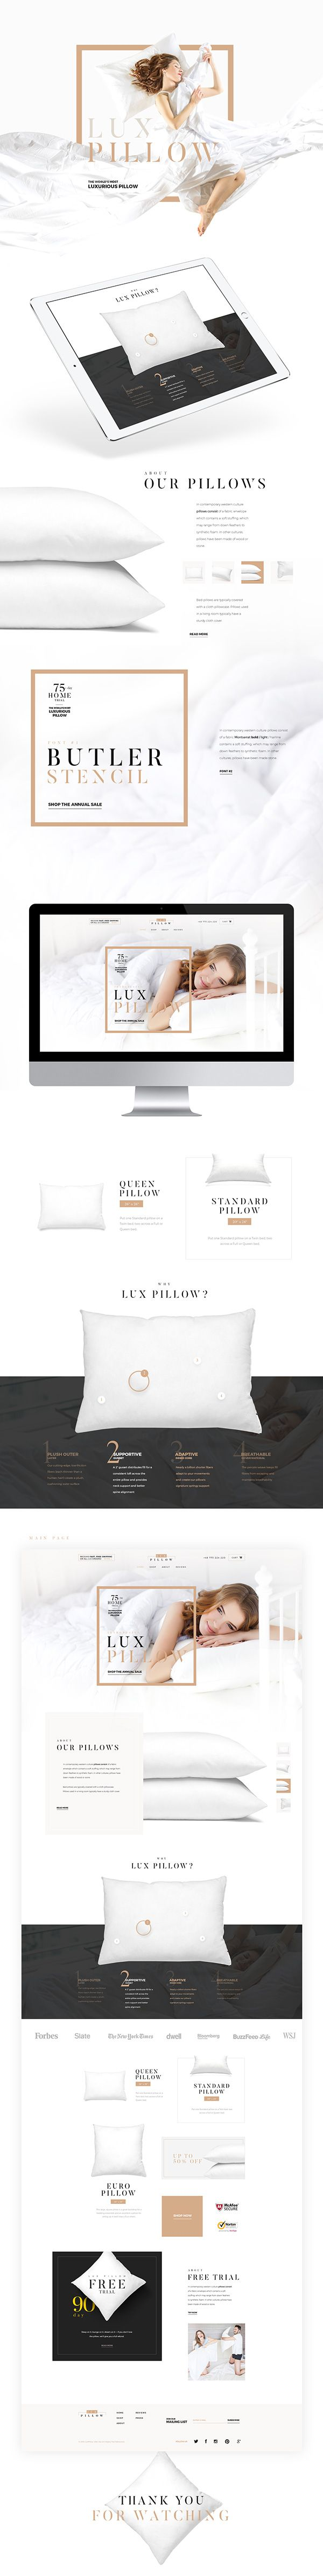 Web design. Modern website. Luxury pillow online shop. Design for sale.